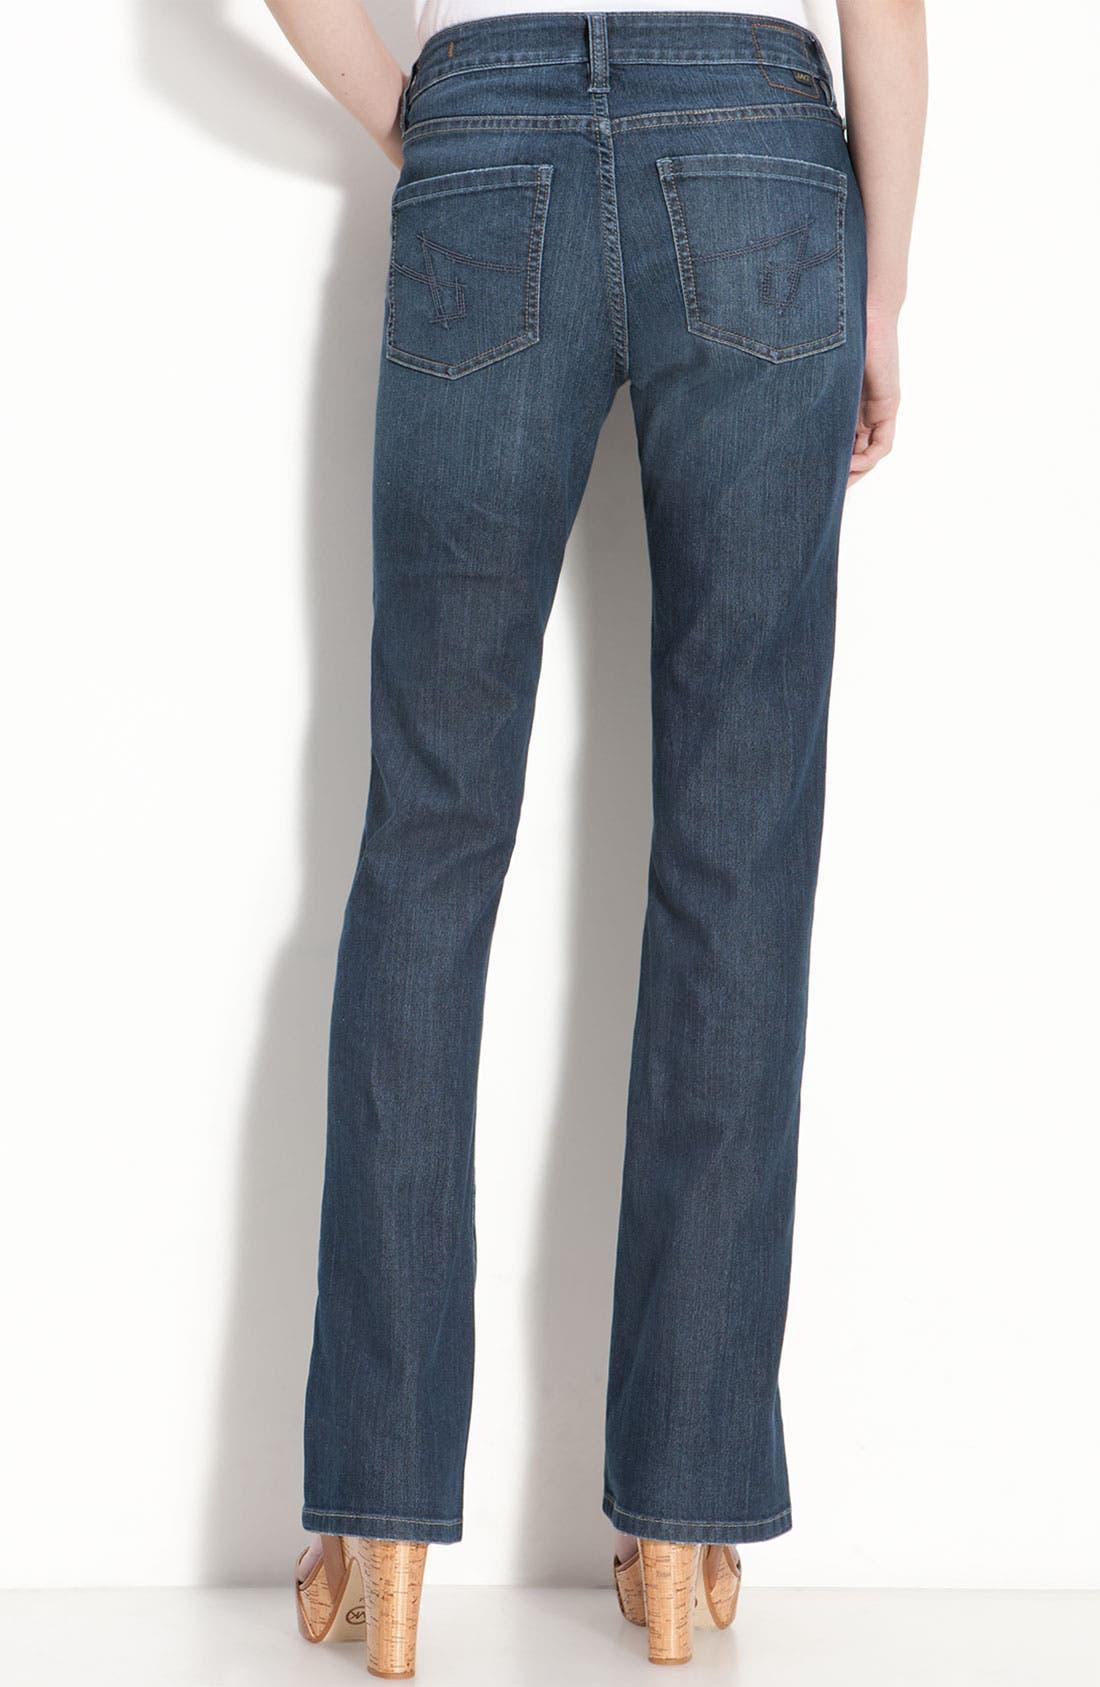 Alternate Image 2  - Jag Jeans 'Trudie' Slim Flare Leg Jeans (Petite) (Online Exclusive)